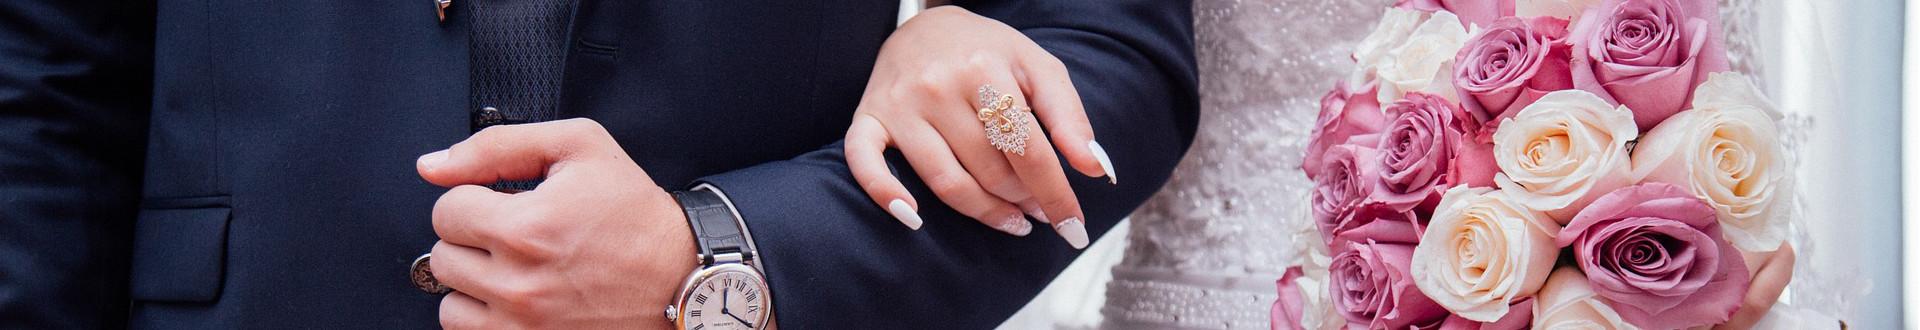 Jobcenter muss Hochzeit nicht bezahlen